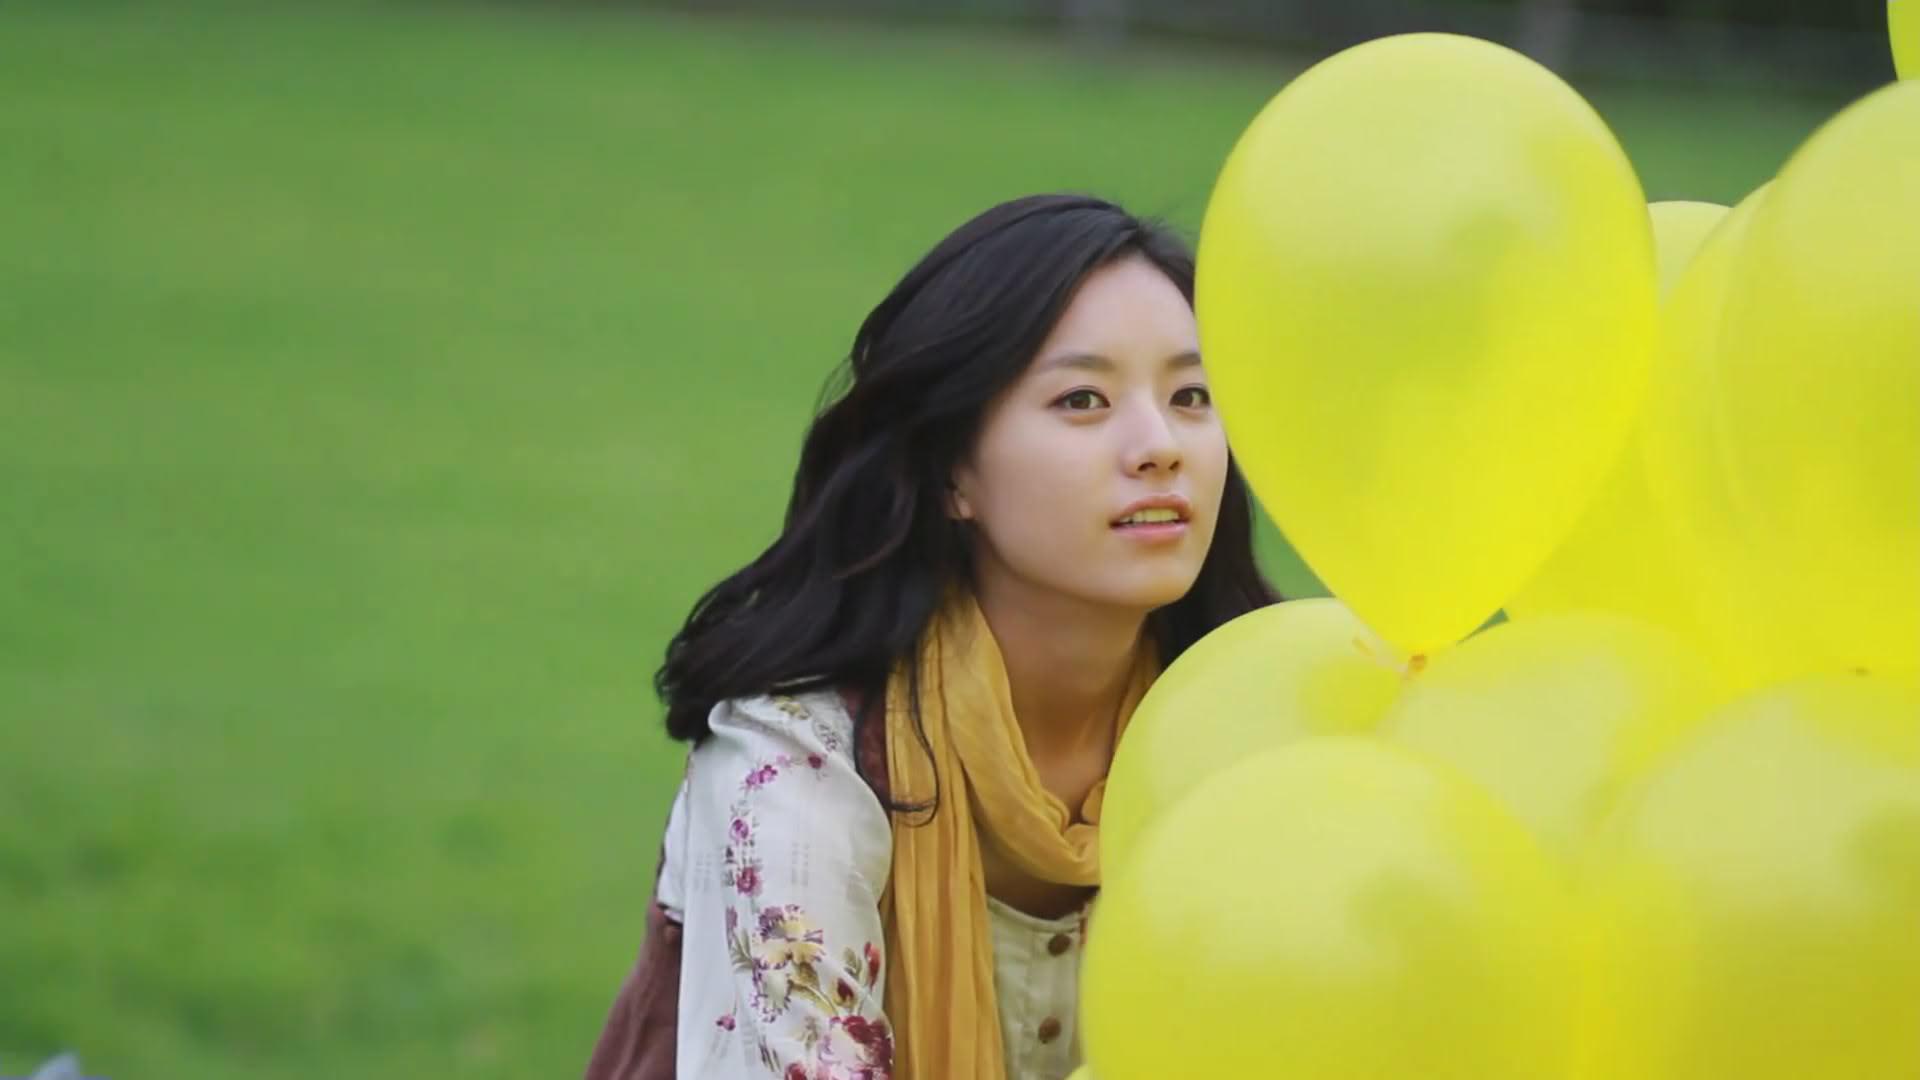 Han Hyo Joo Wallpapers HD